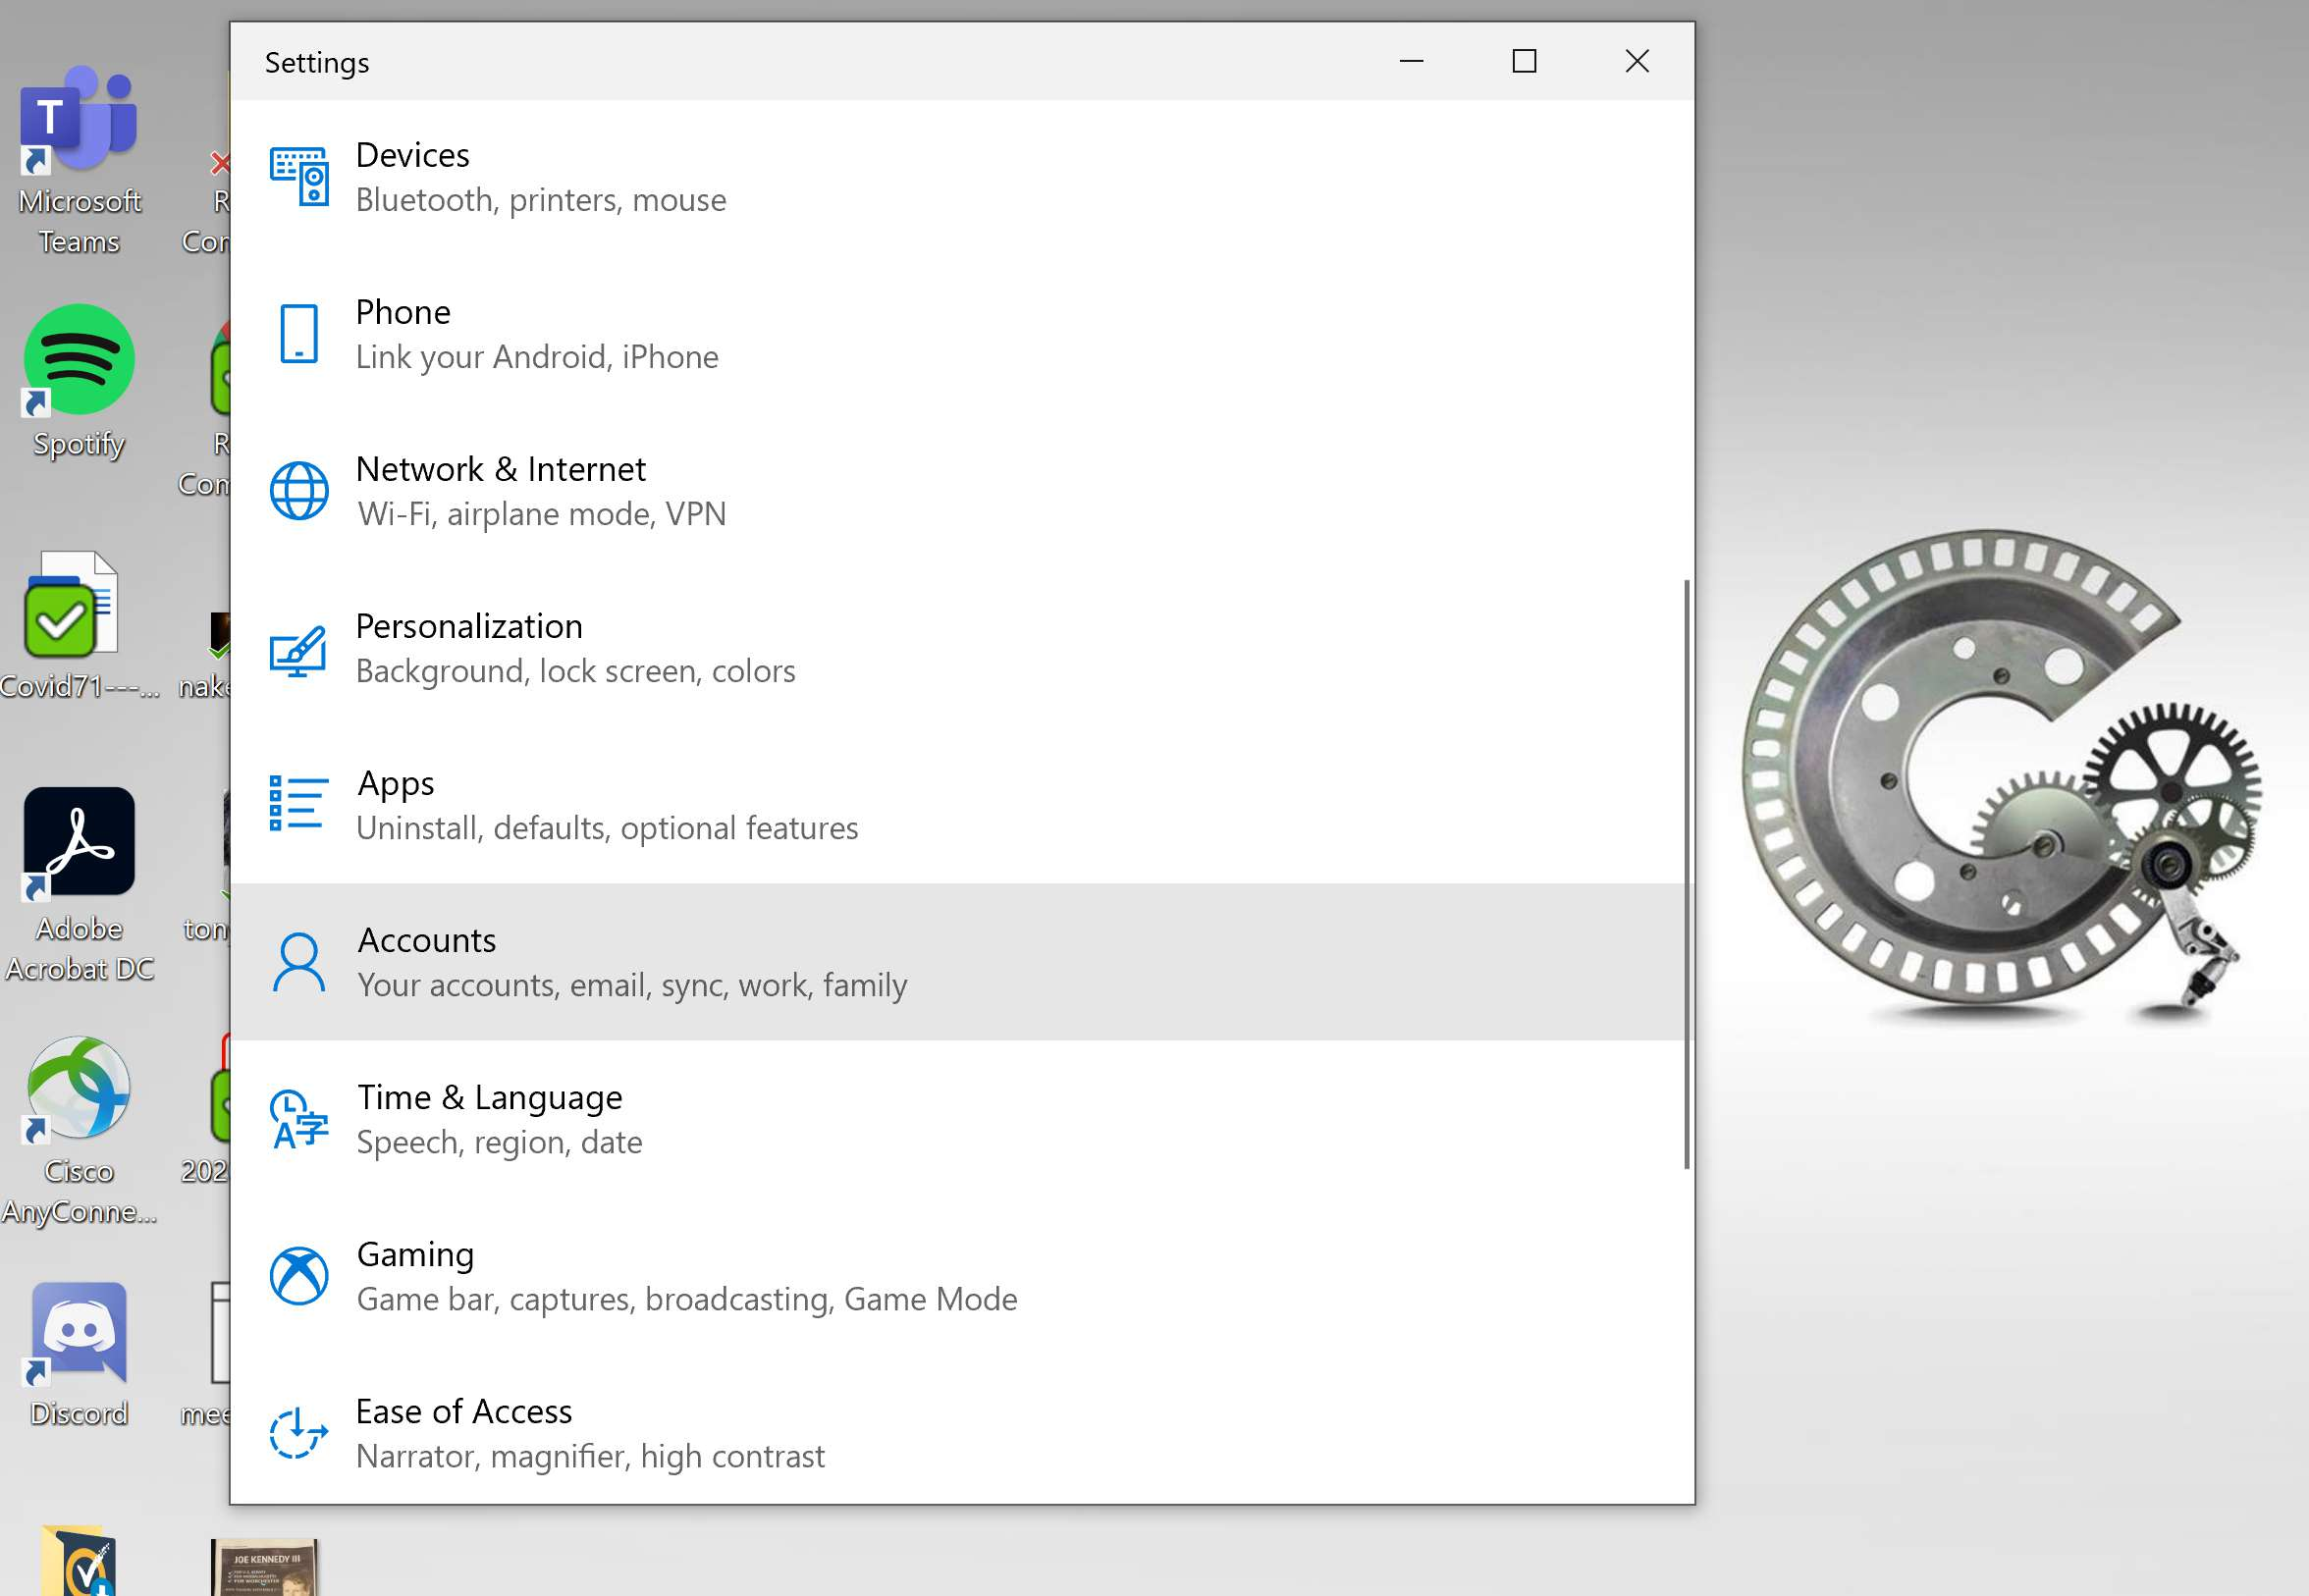 Disabling language sync in Windows 10.